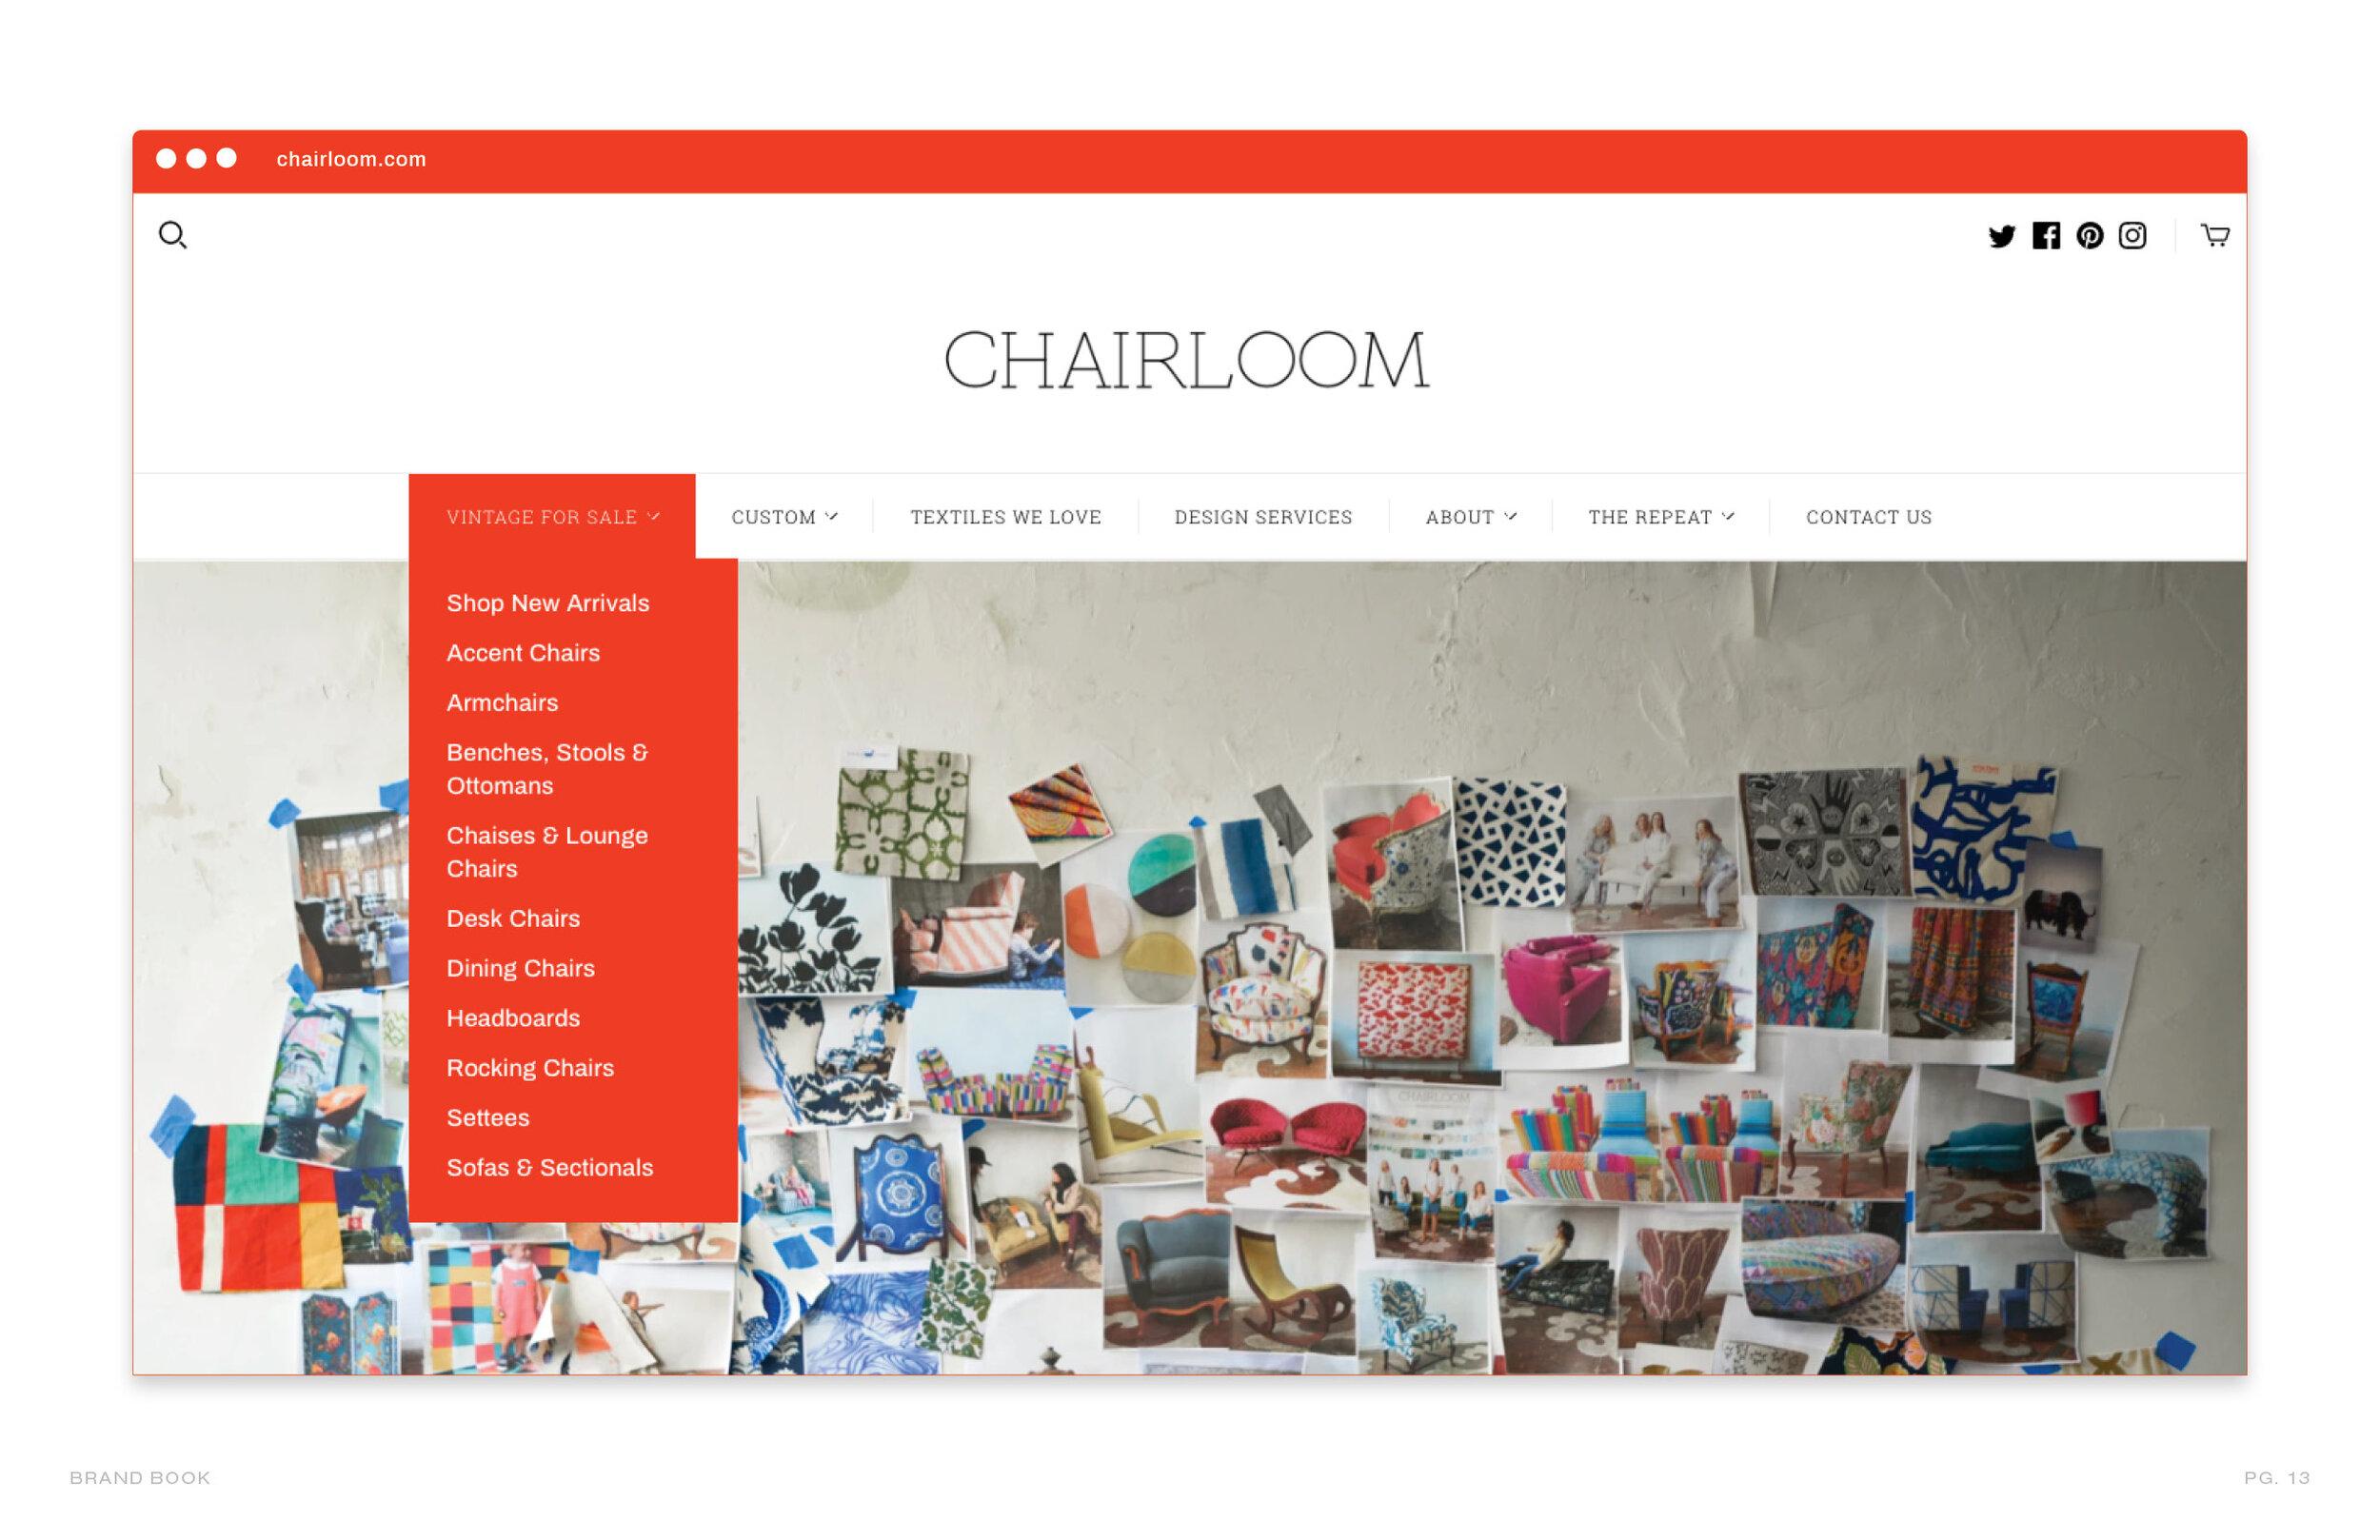 Chairloom_BrandBook_13.jpg